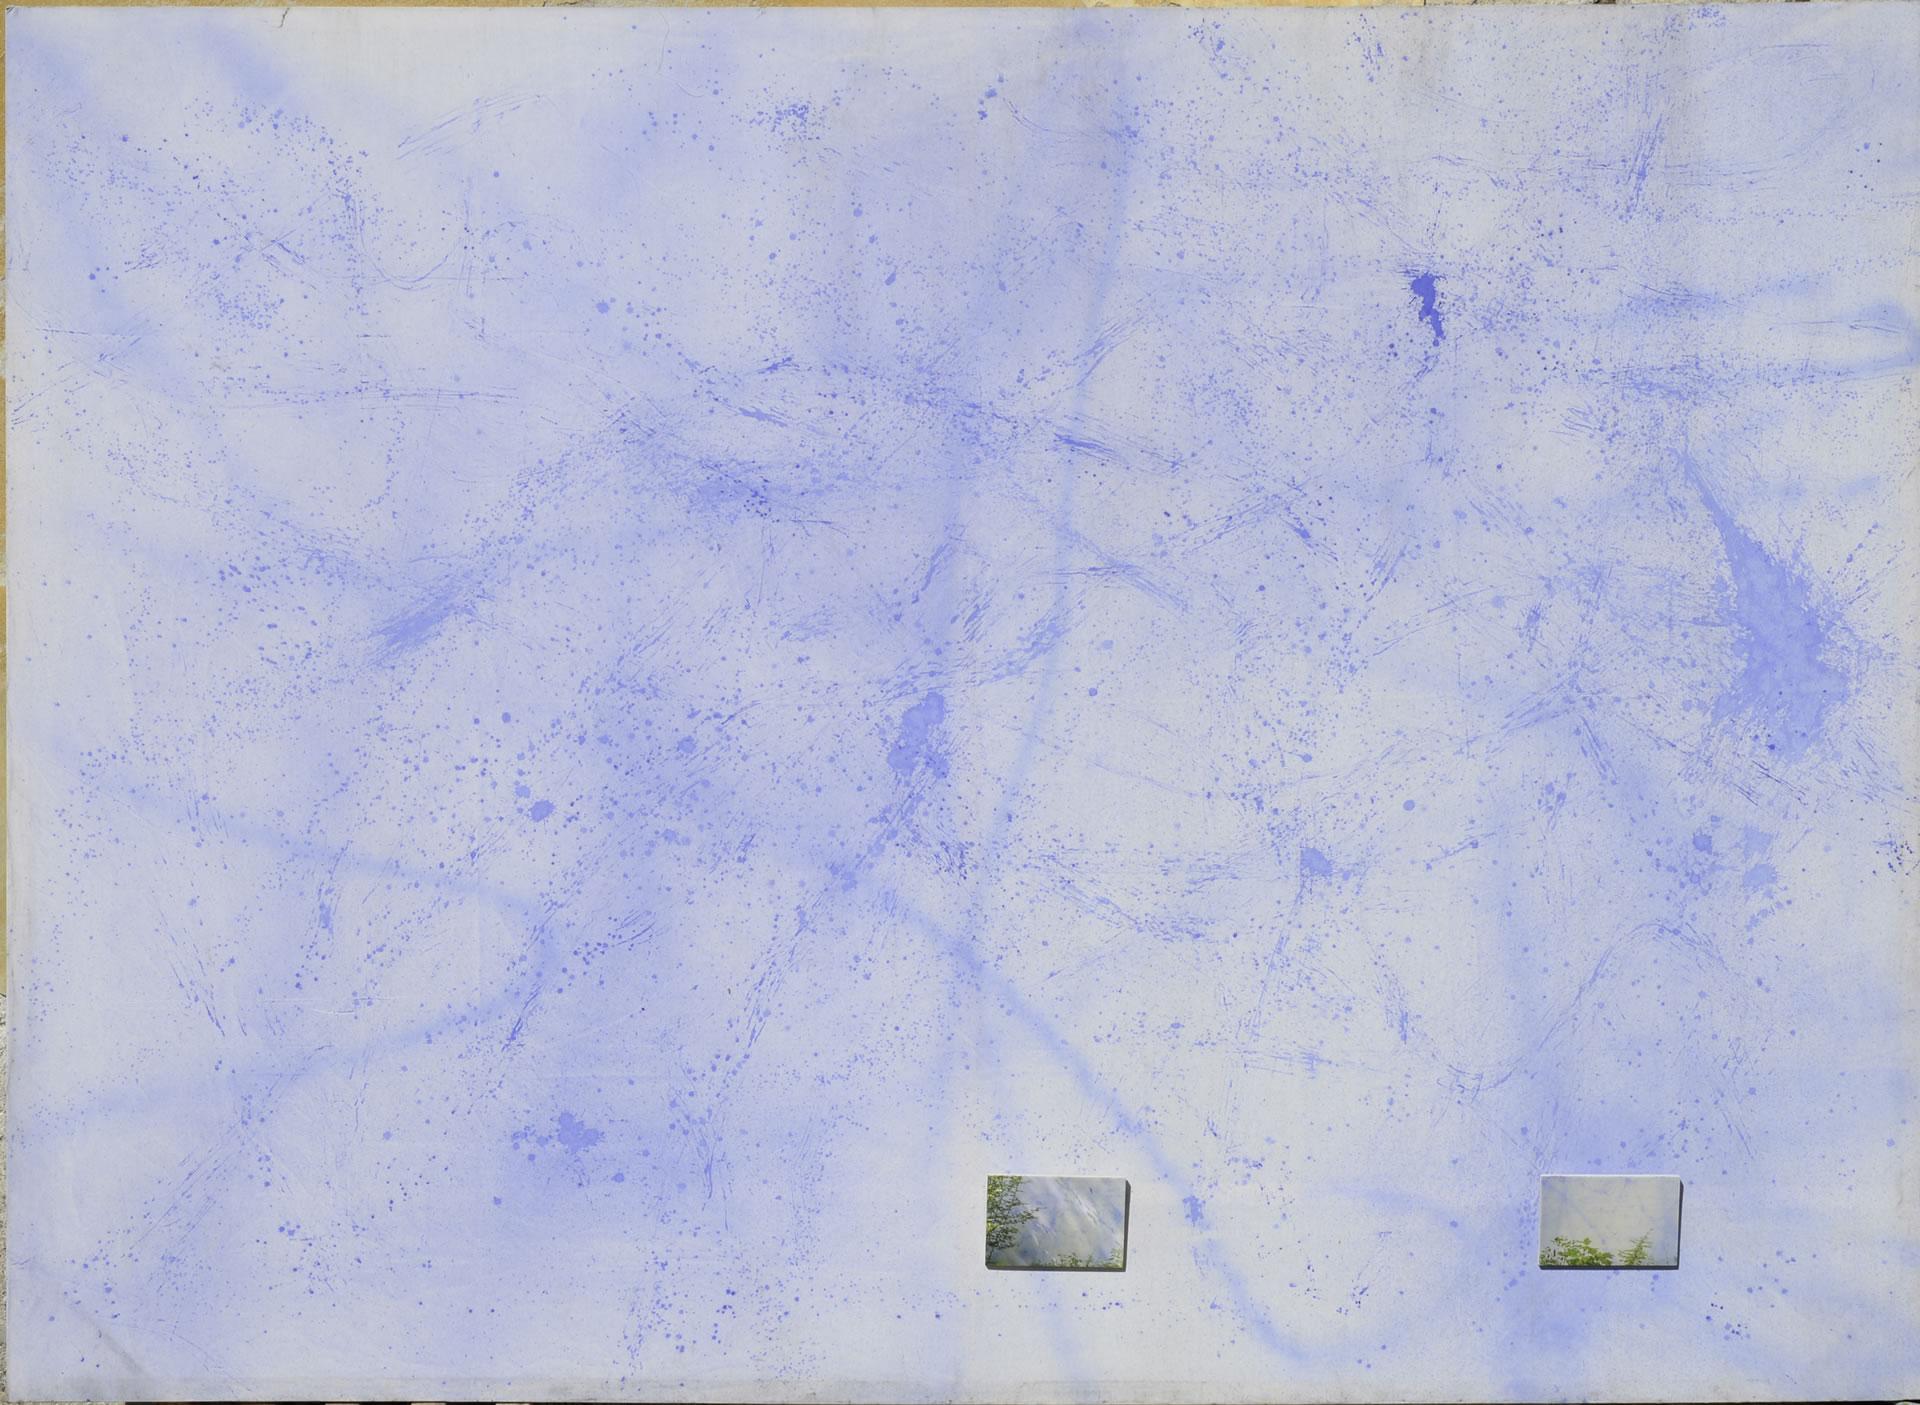 FLUX23 | Markus Orsini-Rosenberg | Skypainting | 2017 | Acryl auf Malermolino | 300 x 410 cm